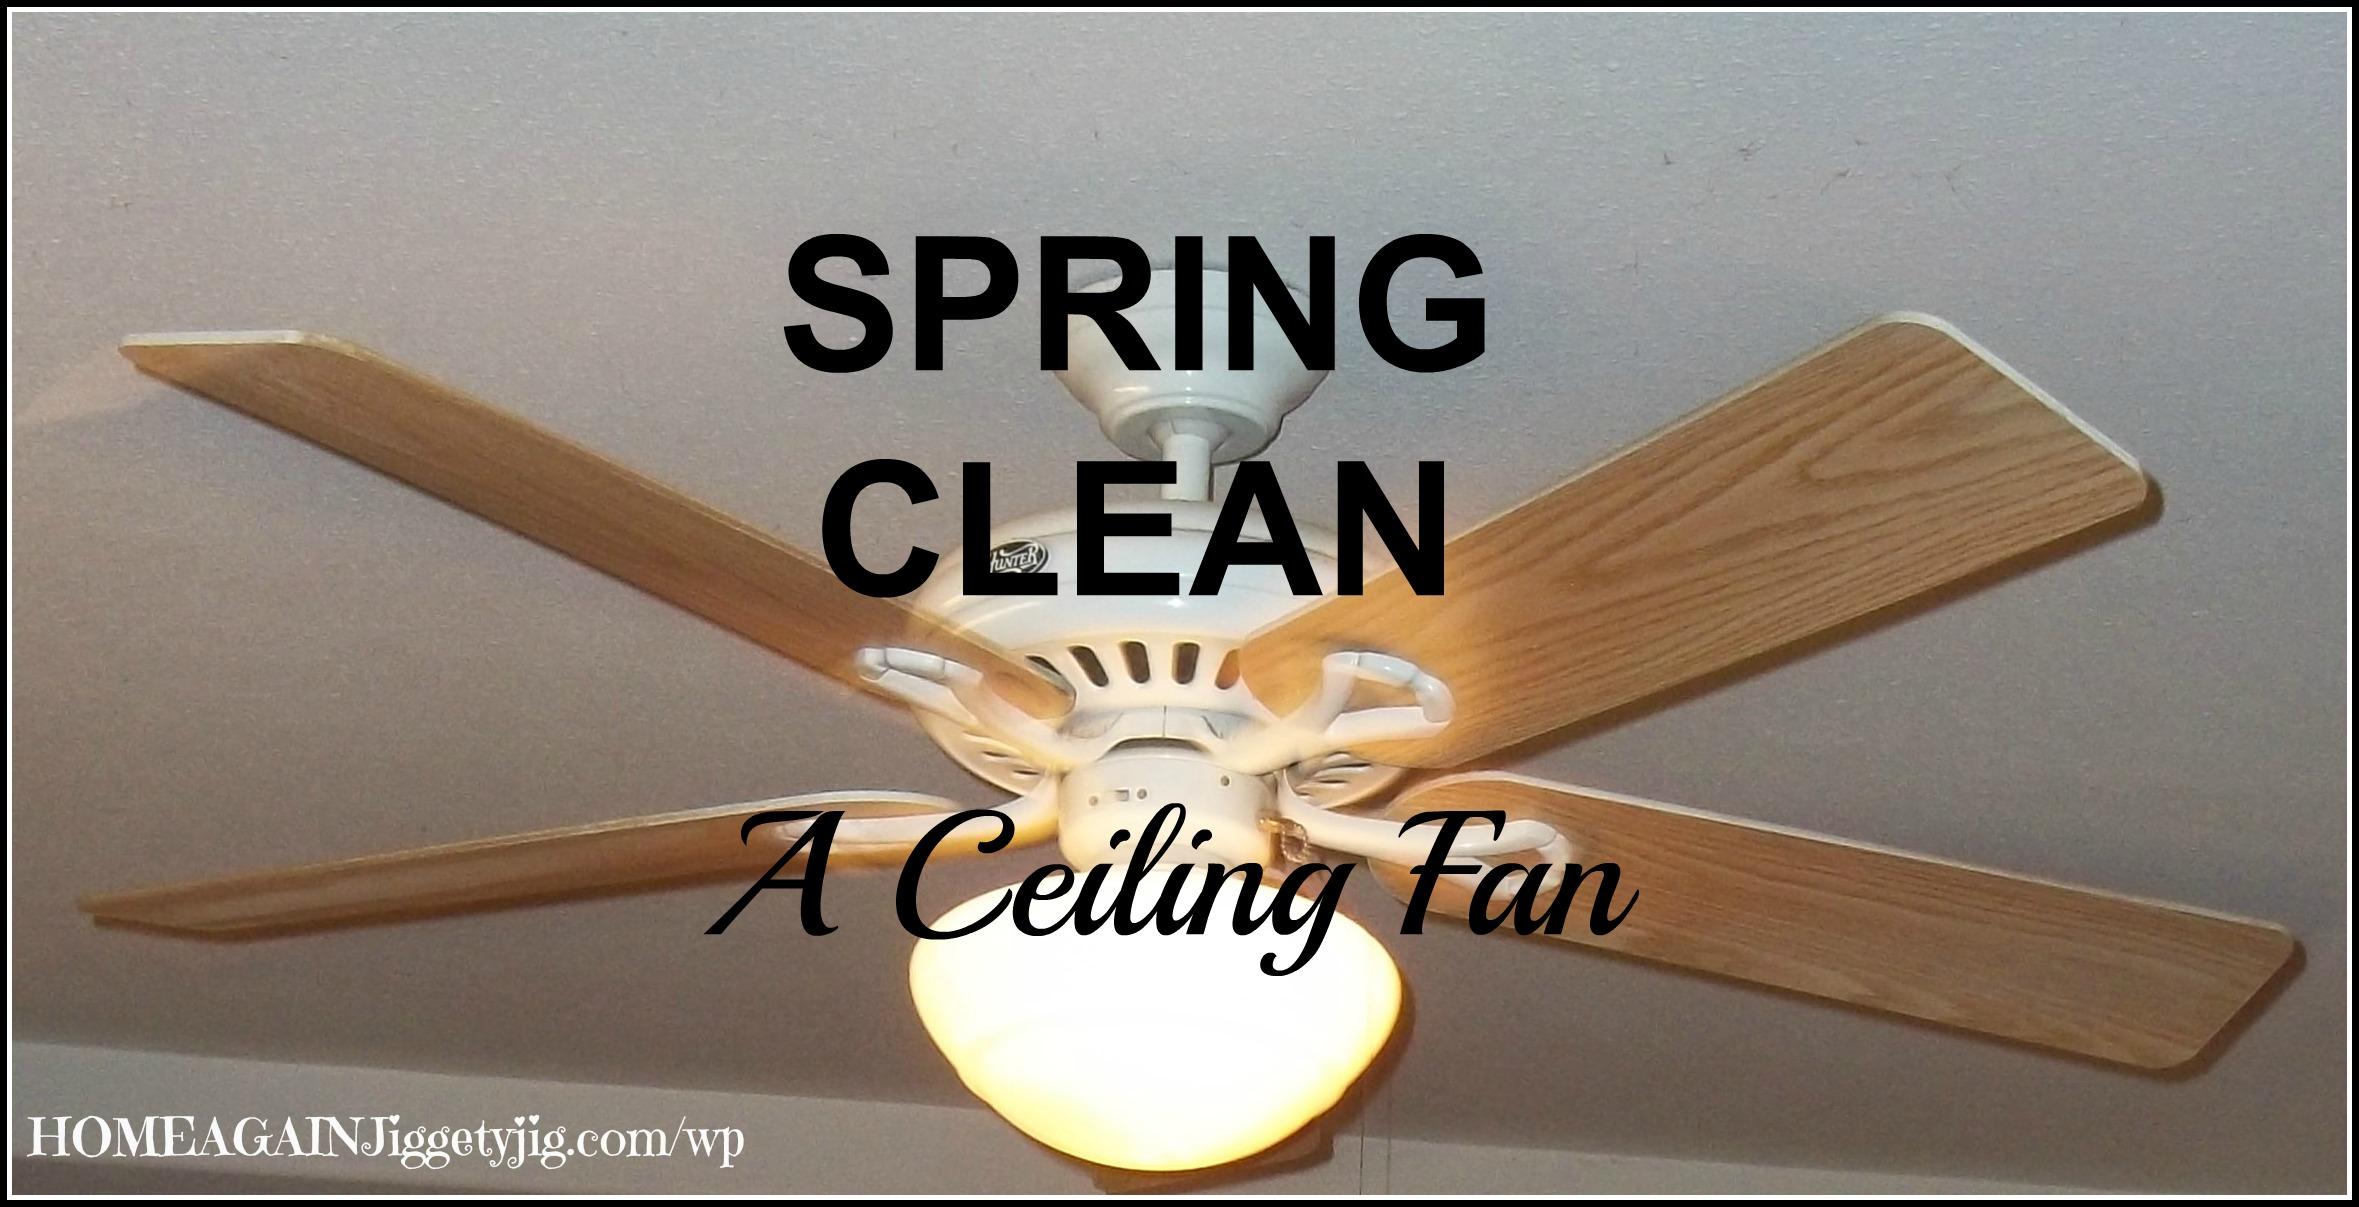 Spring Clean Ceiling Fan